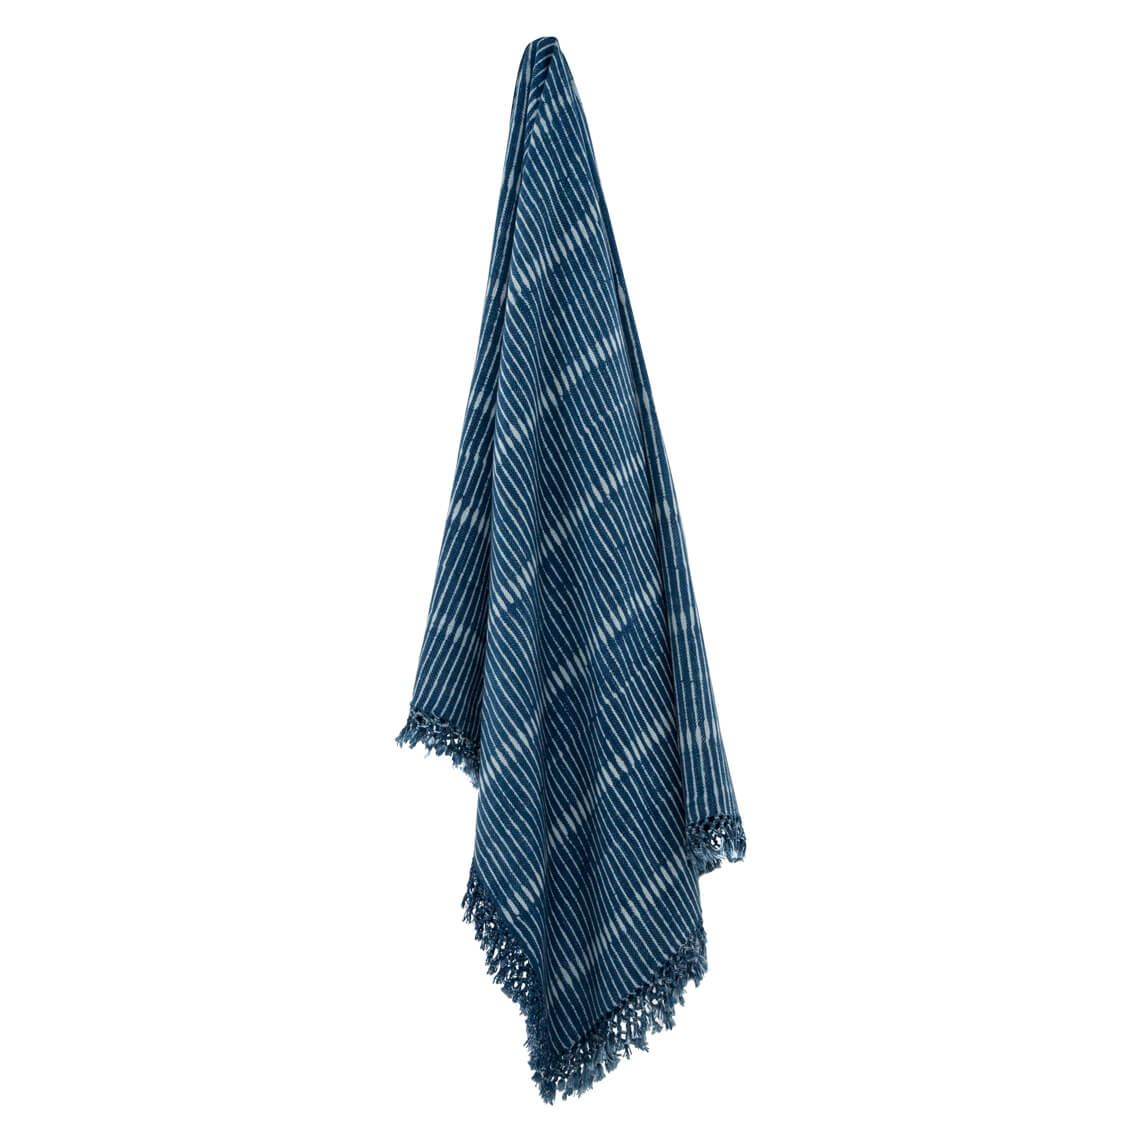 Shiho Throw Size W 34cm x D 34cm x H 8cm in Indigo 100% Cotton Freedom